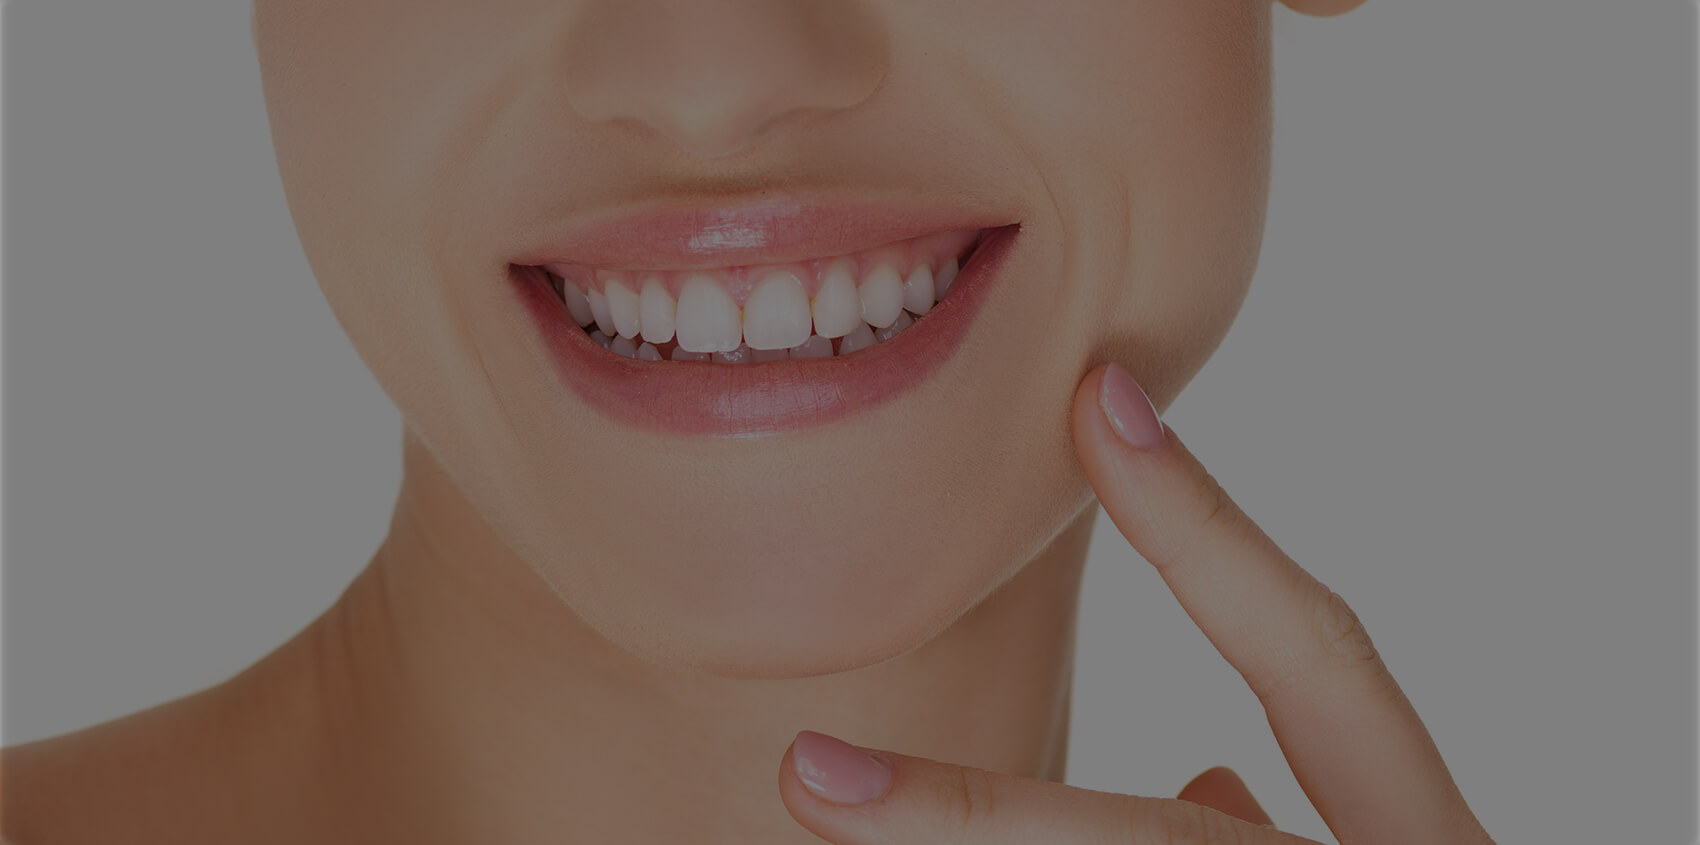 Are You Seeking Professional Teeth Whitening for Bright, White Teeth in Salt Lake City, UT?